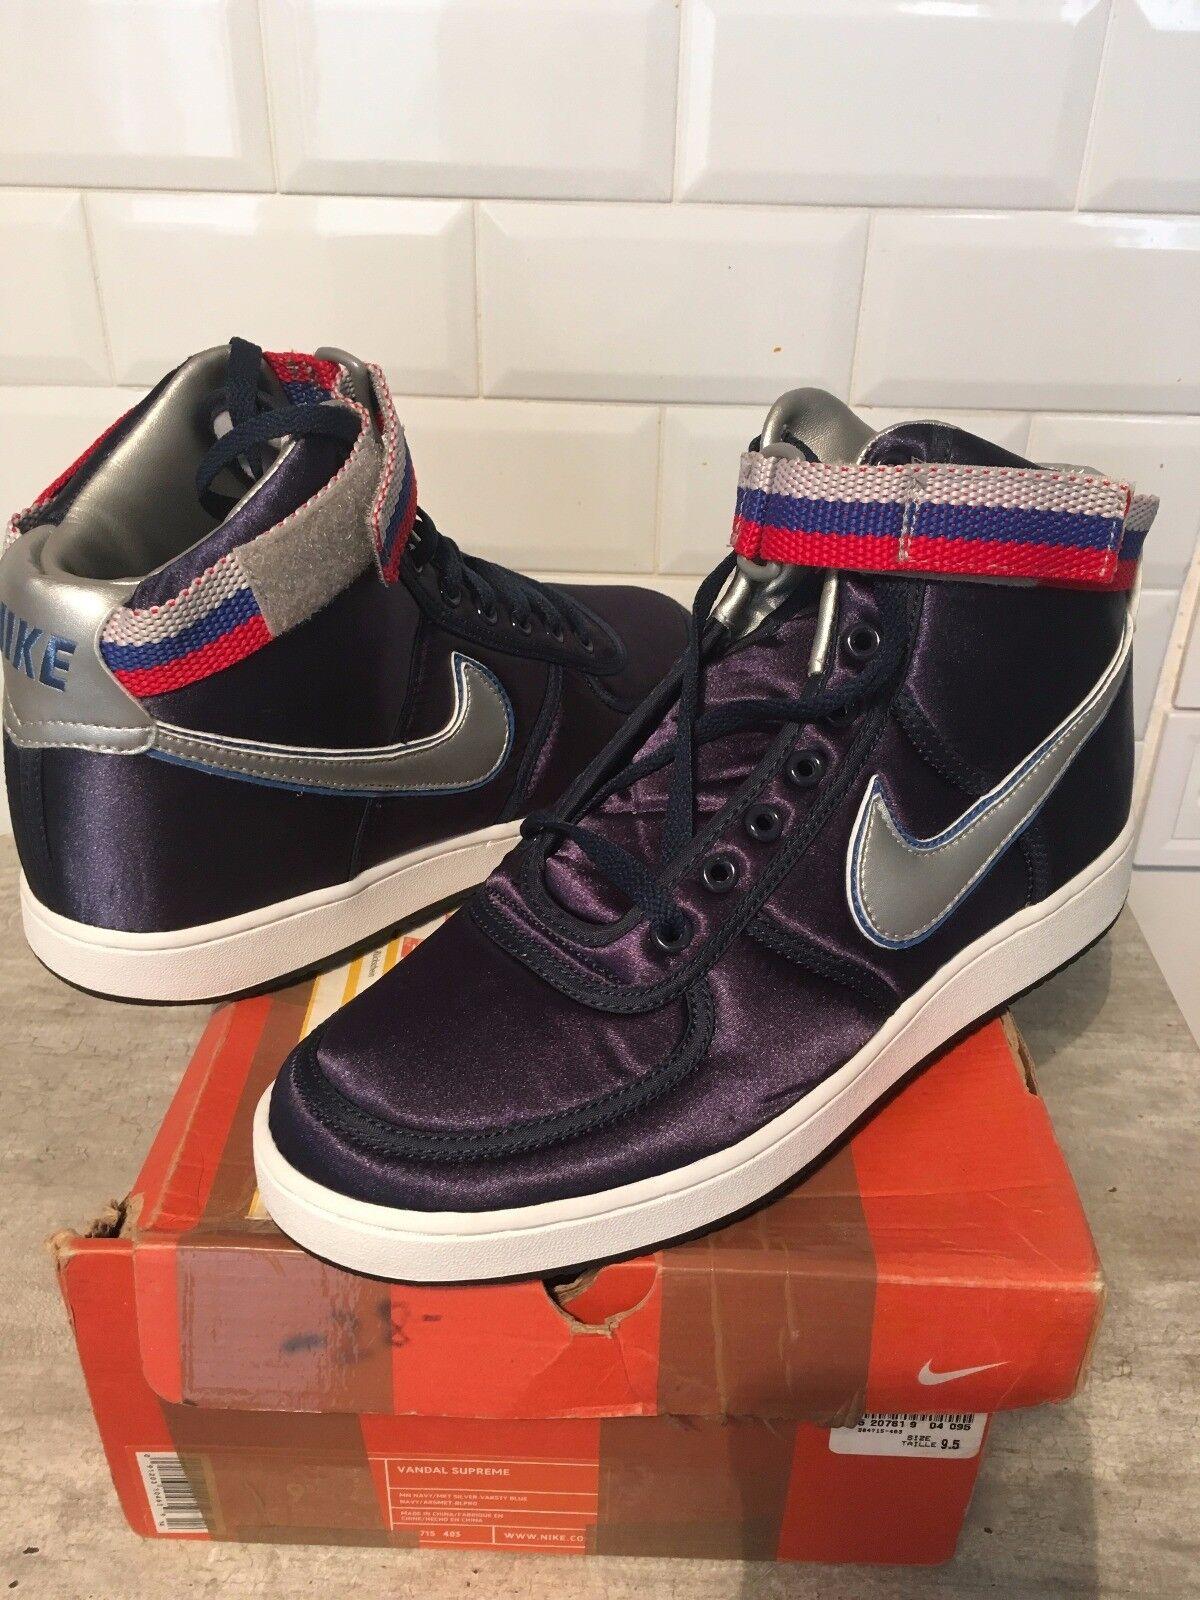 2003 Nike Vandal Supreme 9.5 US   43 EUR